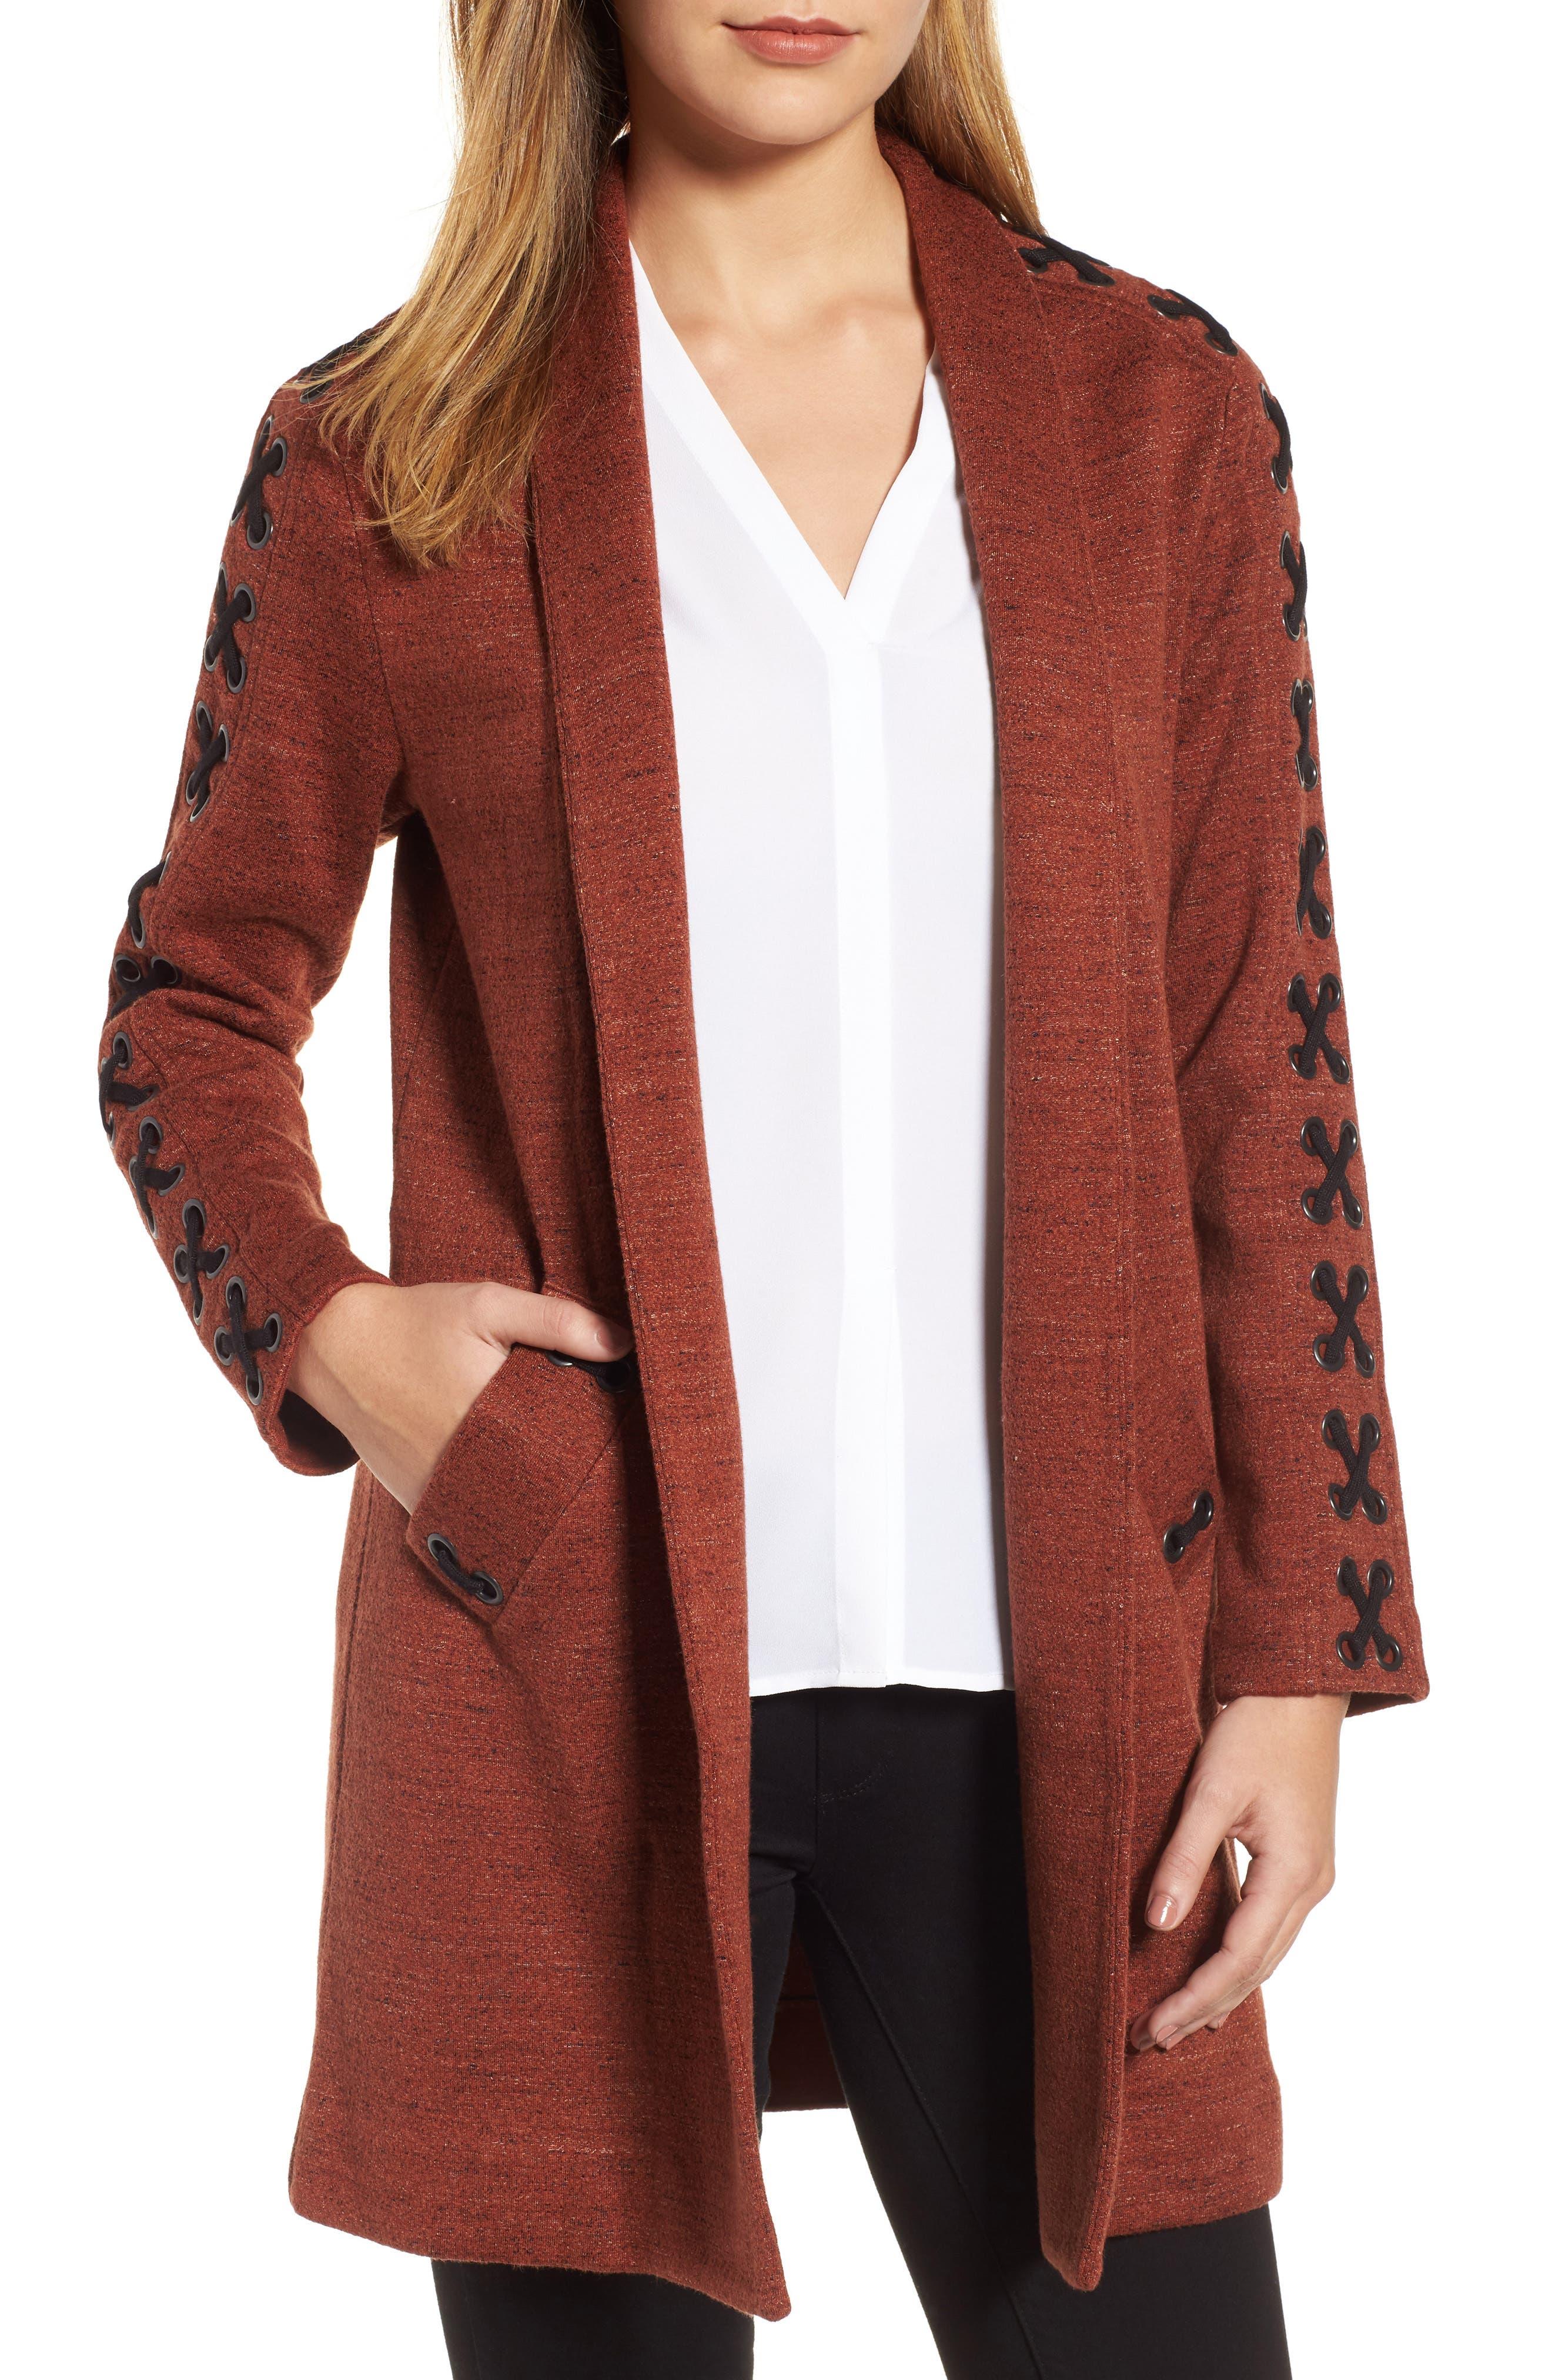 Main Image - NIC+ZOE Crisscross Detail Knit Jacket (Regular & Petite)